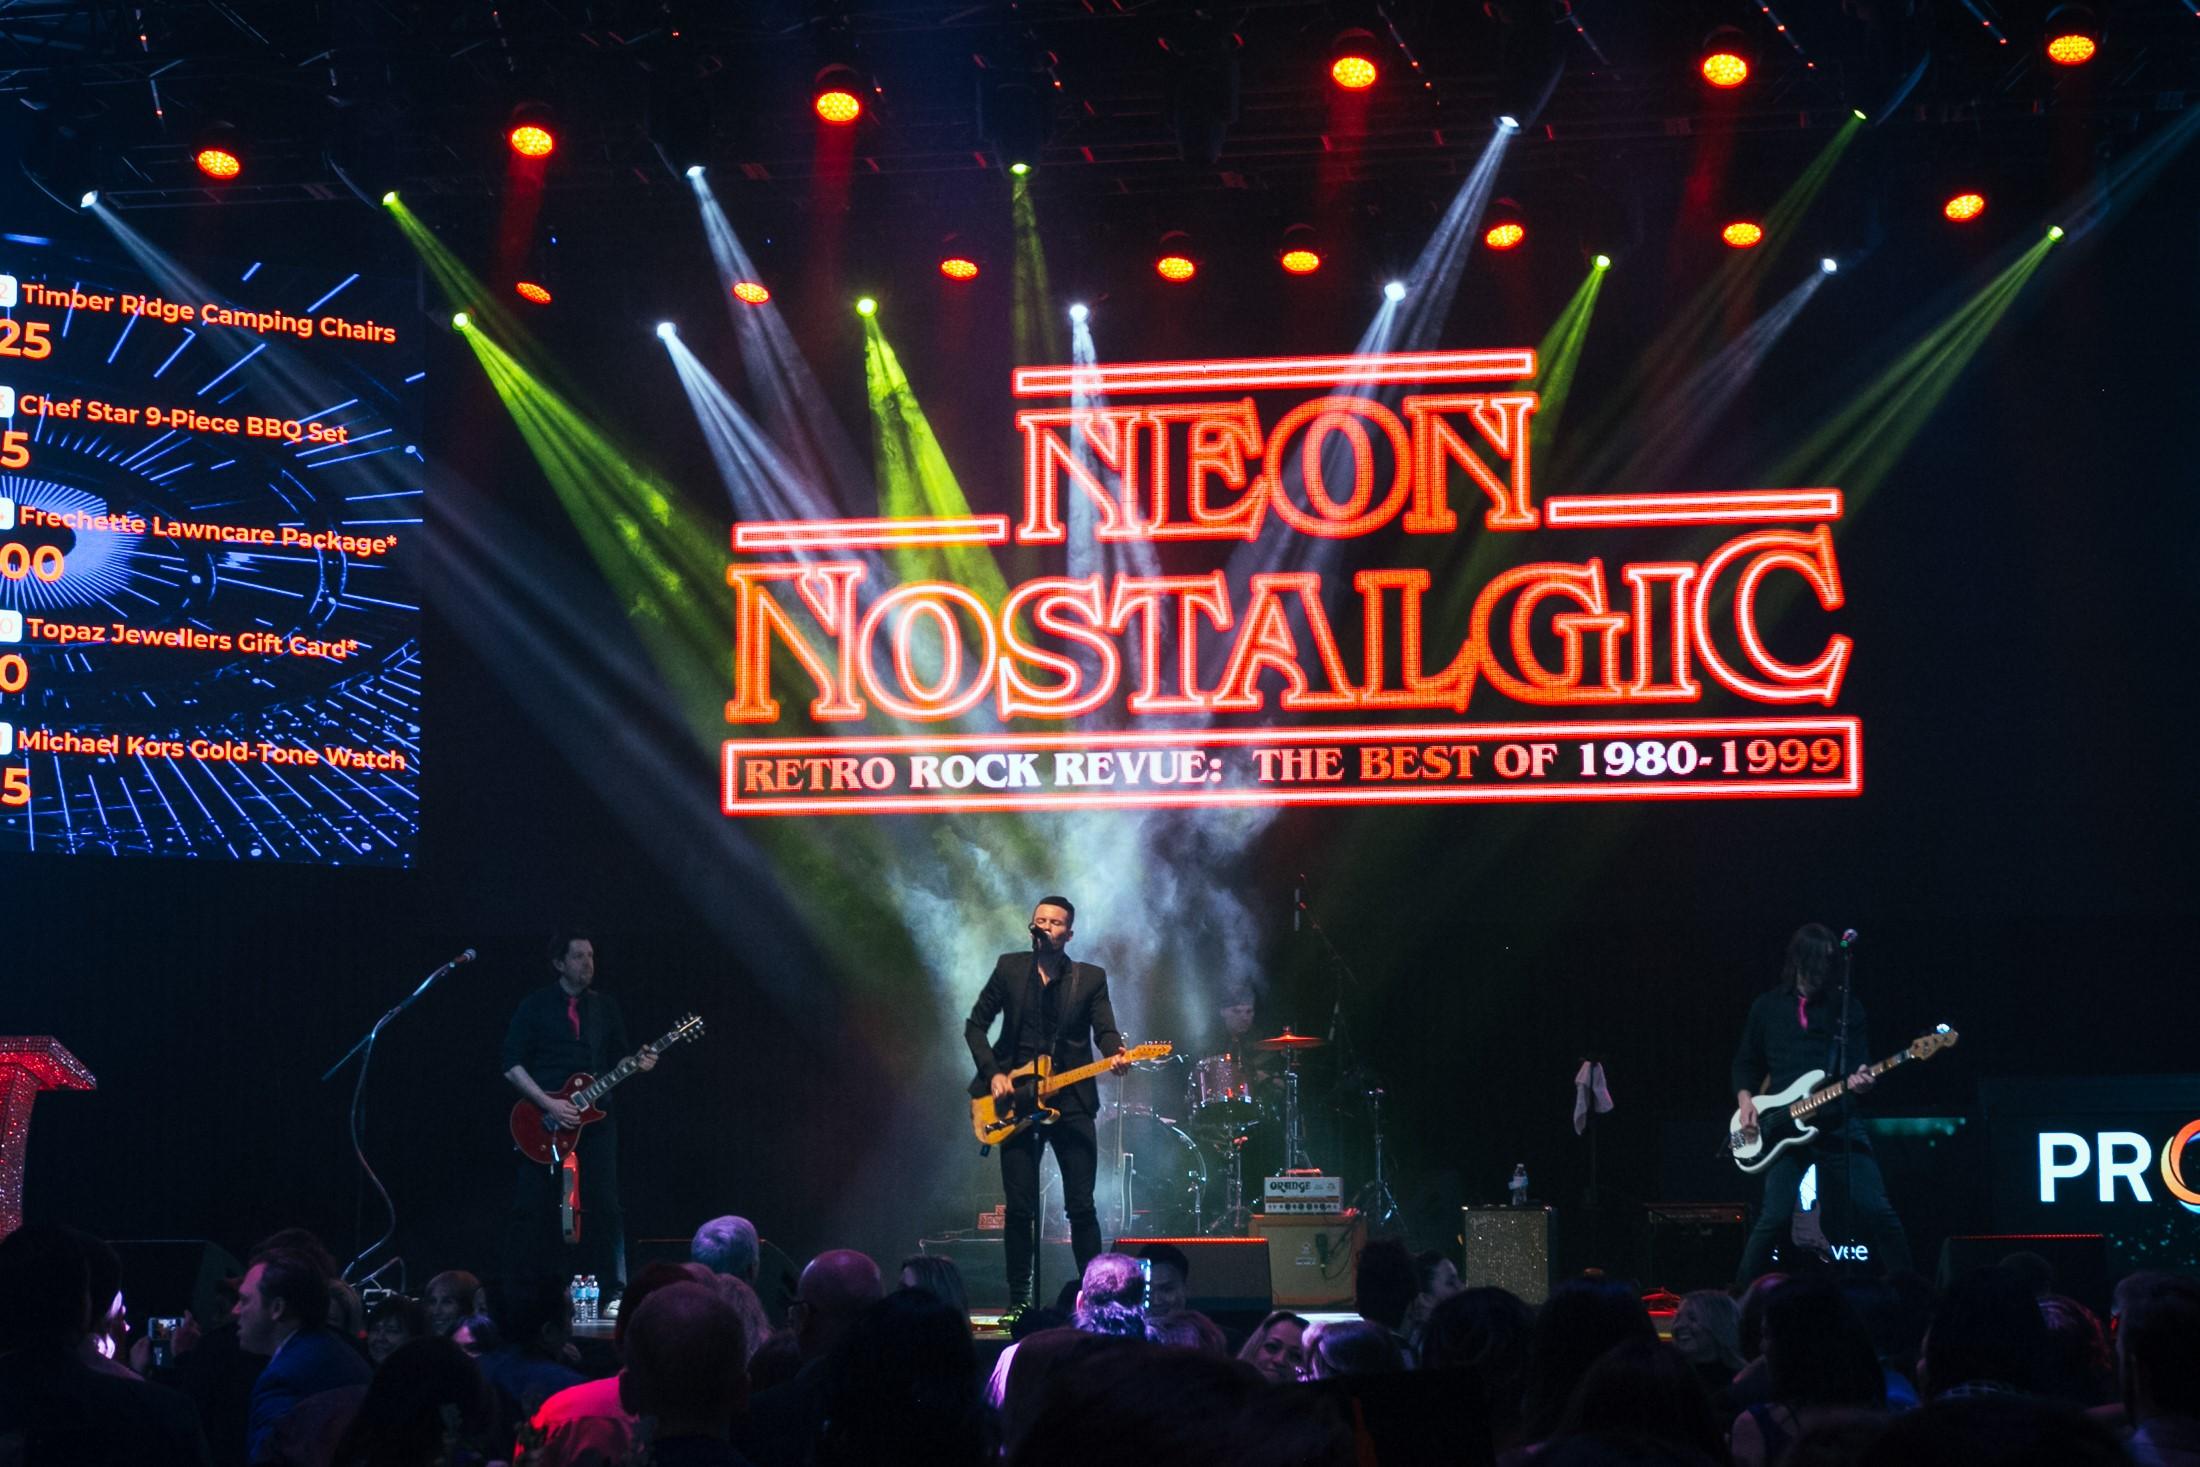 Shawn Brady and Neon Nostalgic